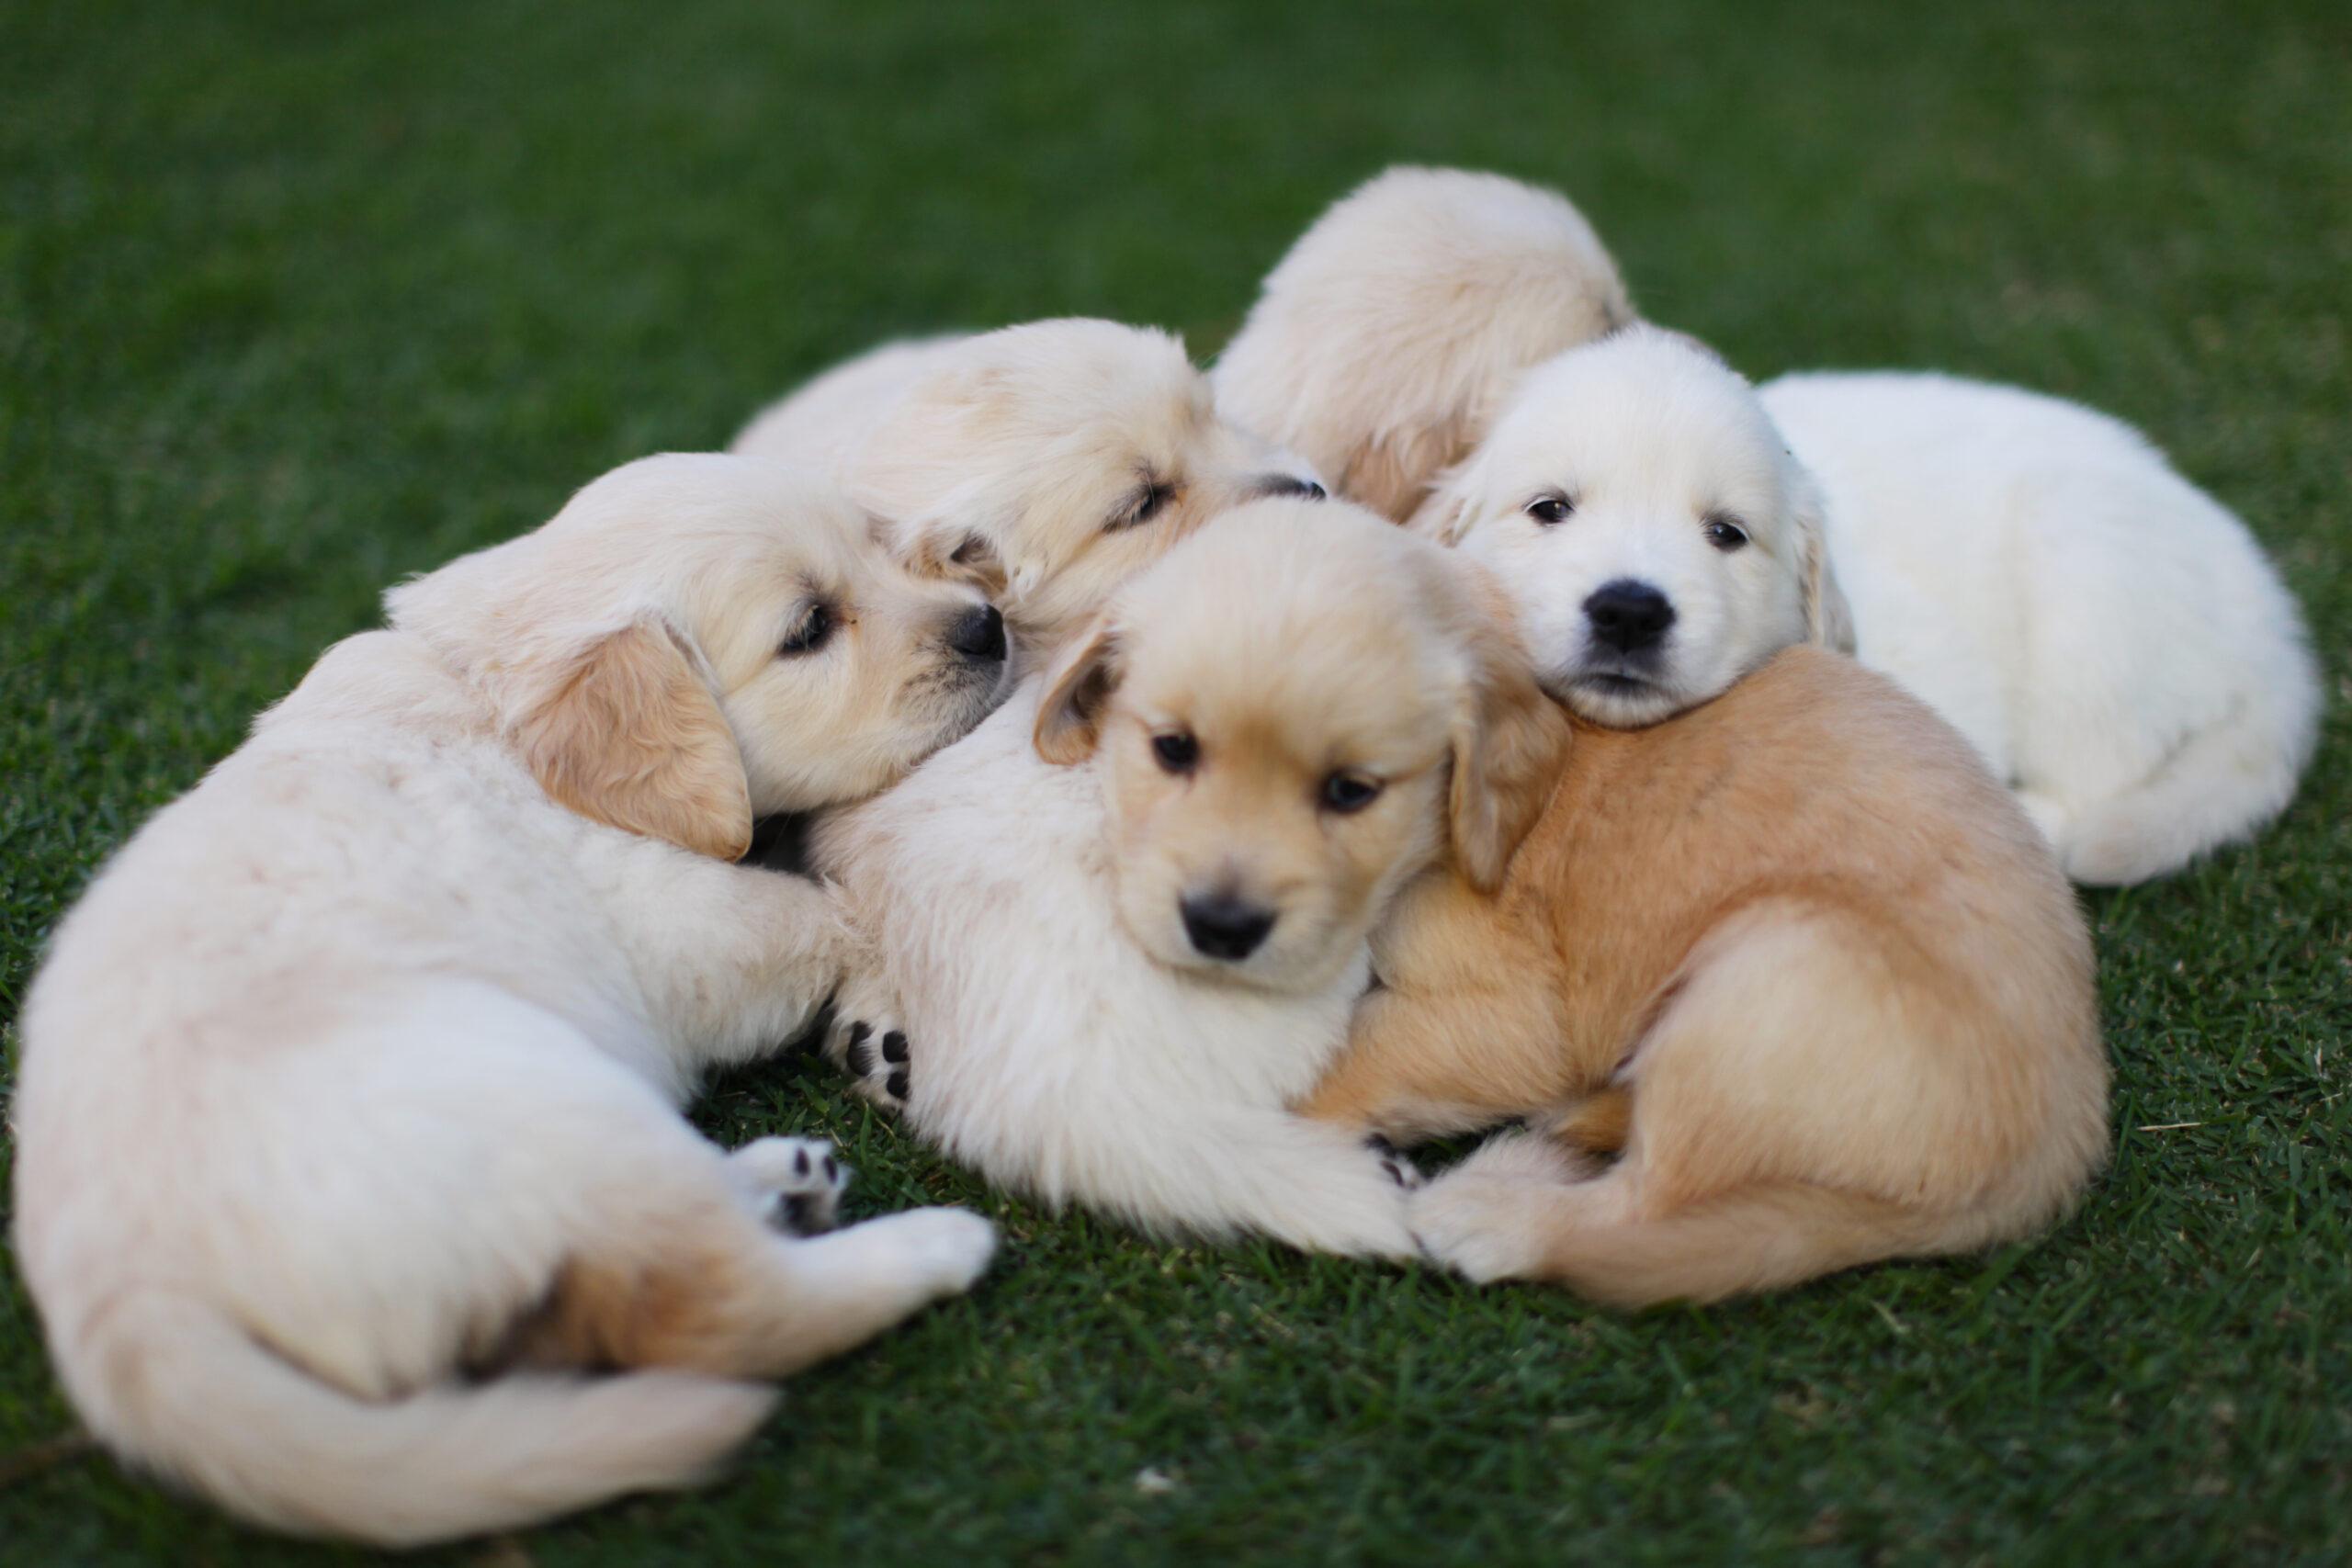 Dog development stages